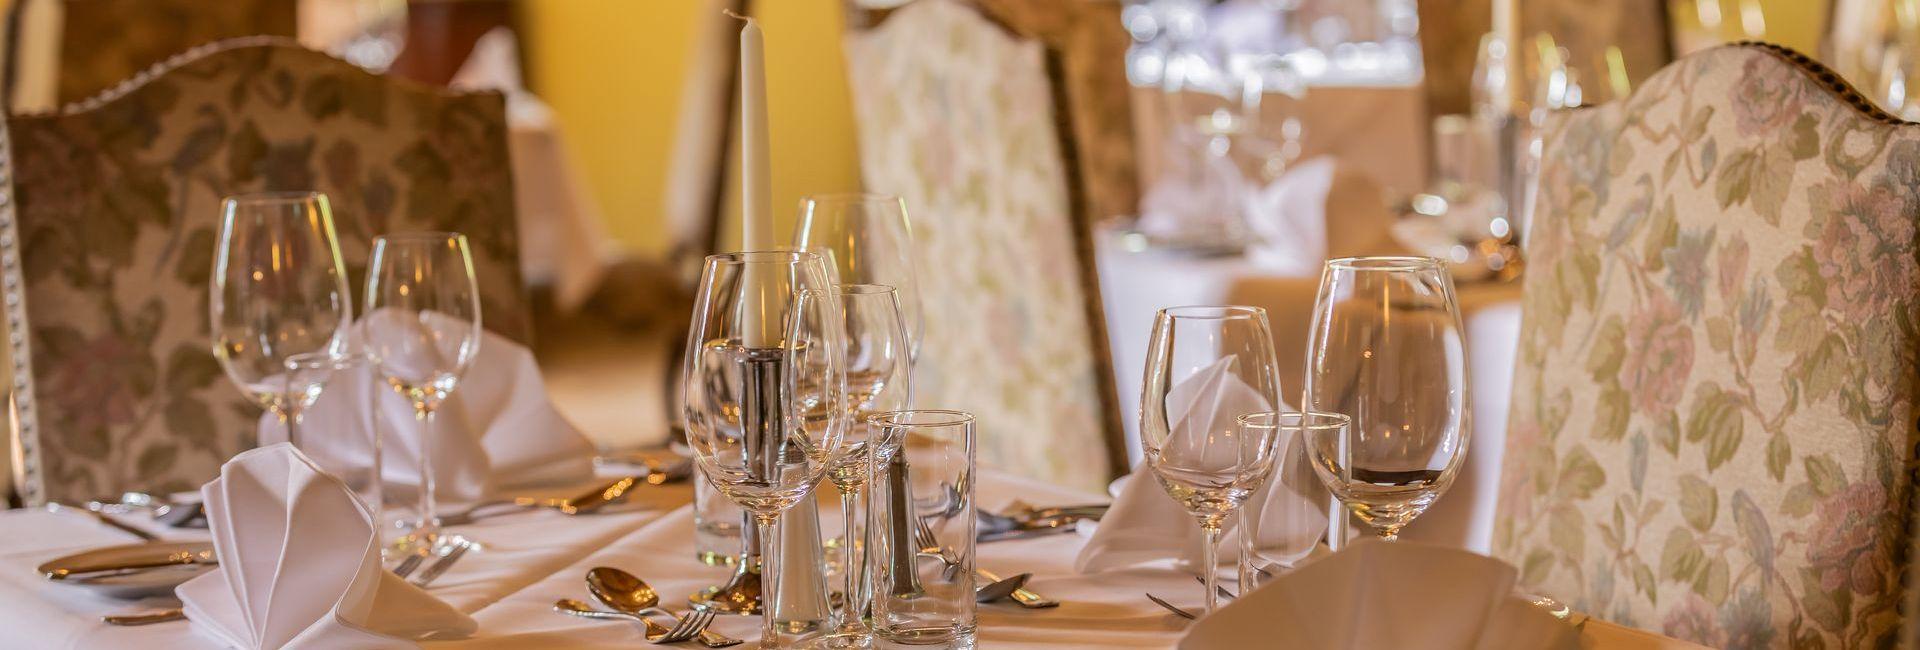 Restaurant at Castle Hotel Weikersdorf